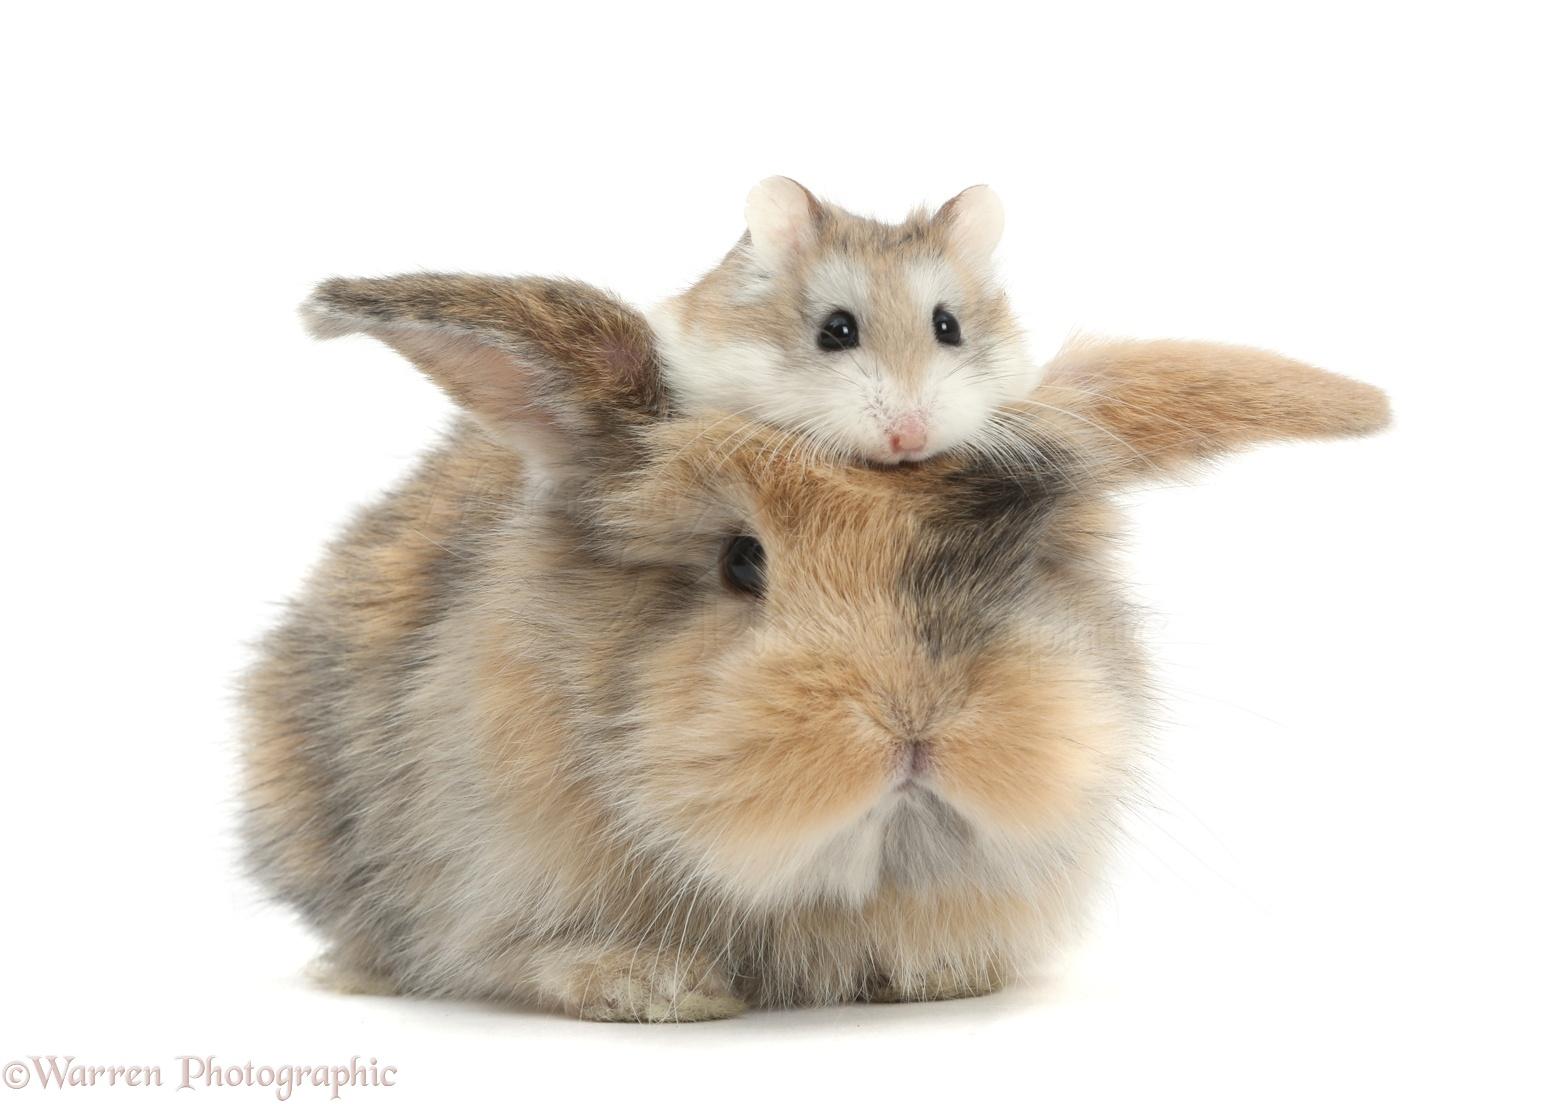 Pin Cute Baby Robo Dwarf Hamsters on Pinterest